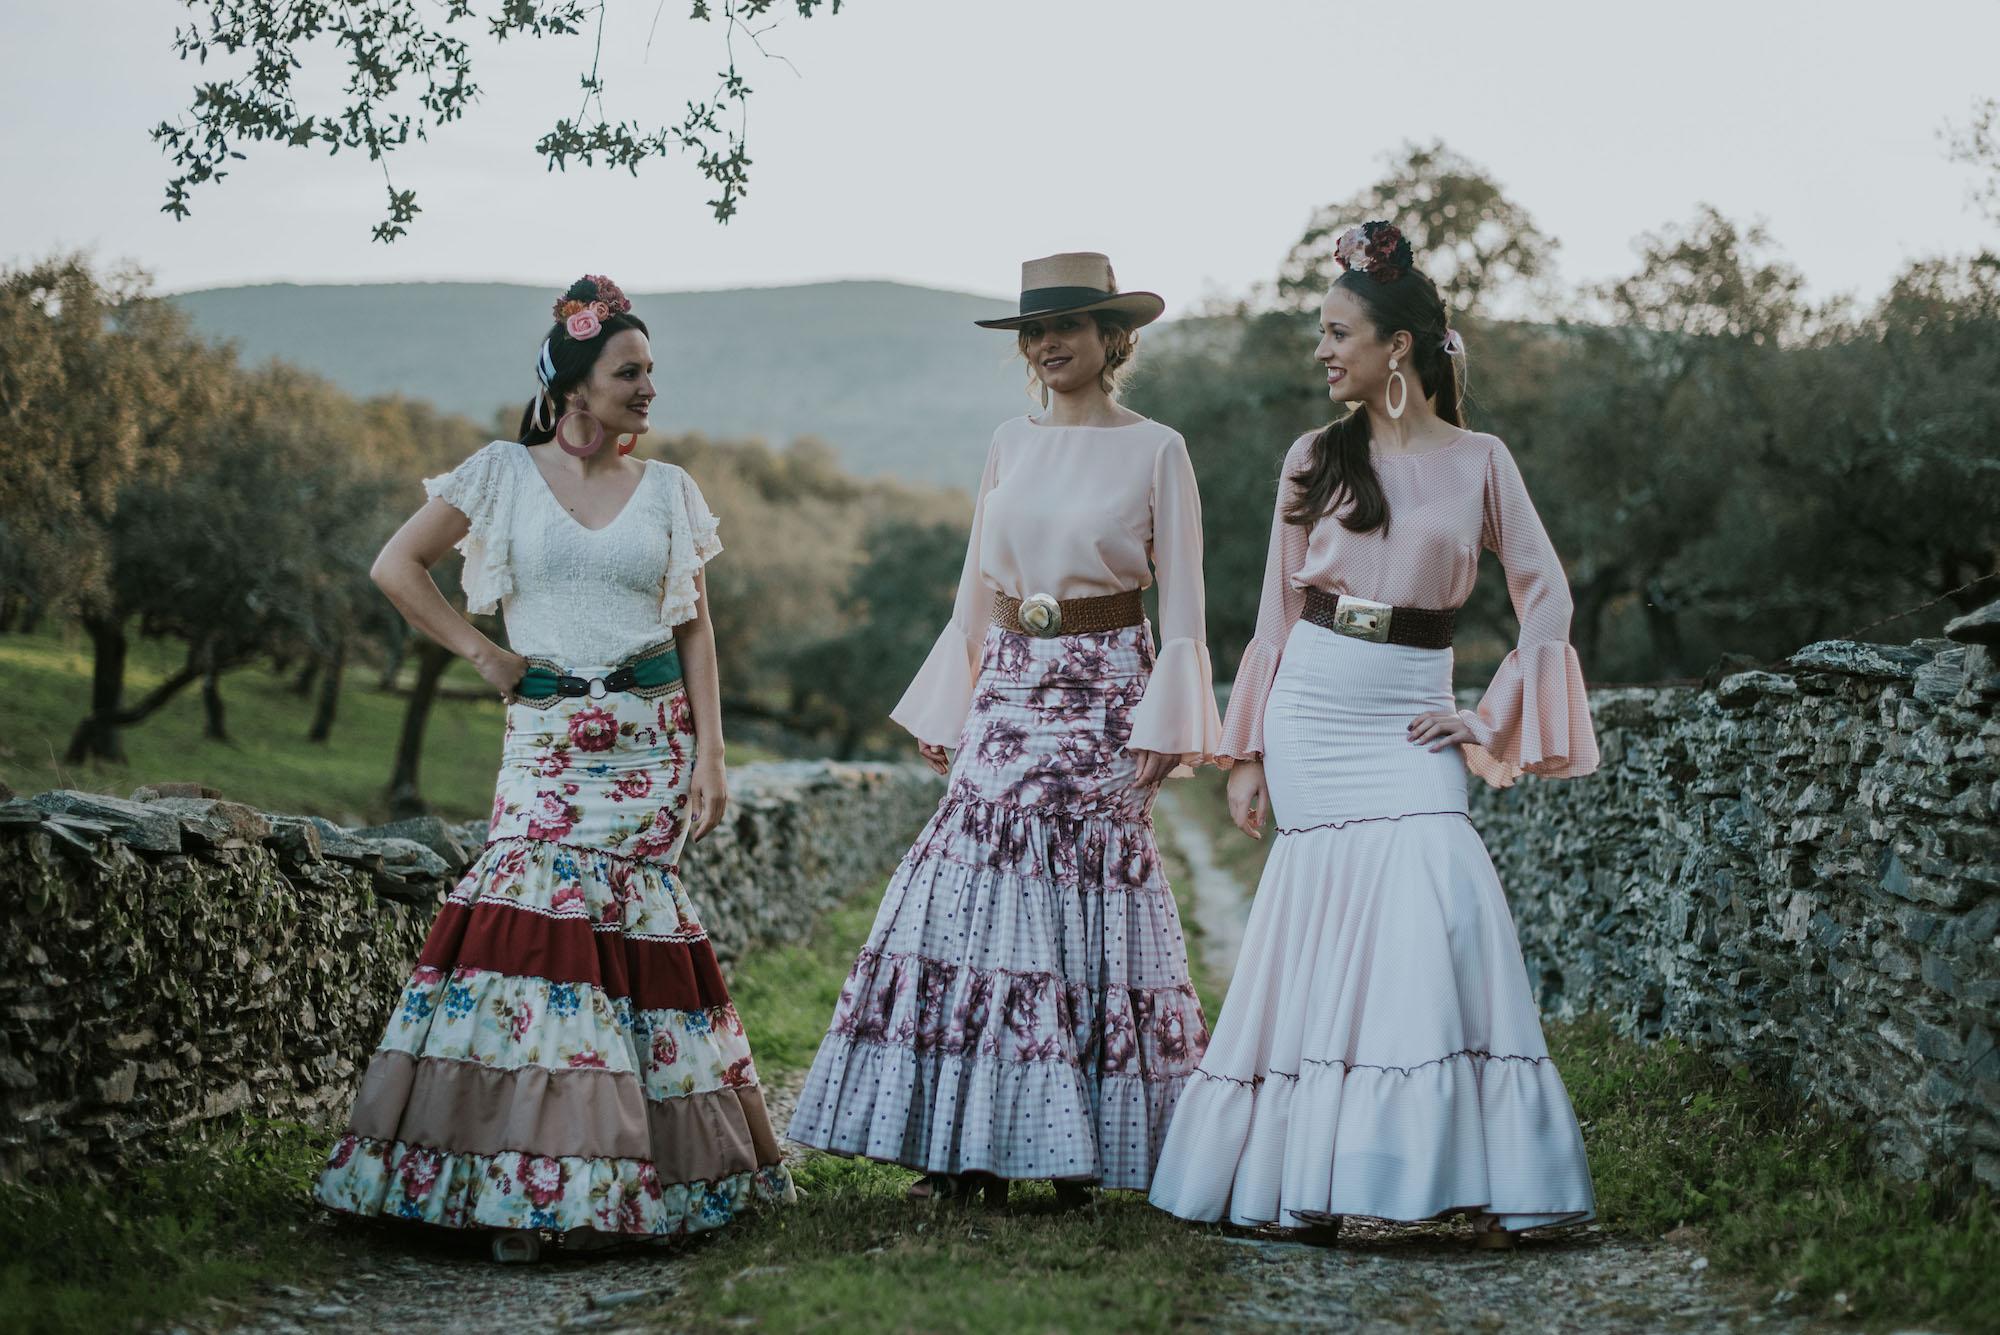 Isabel_hernandez_faldas_flamencas-FF20-184